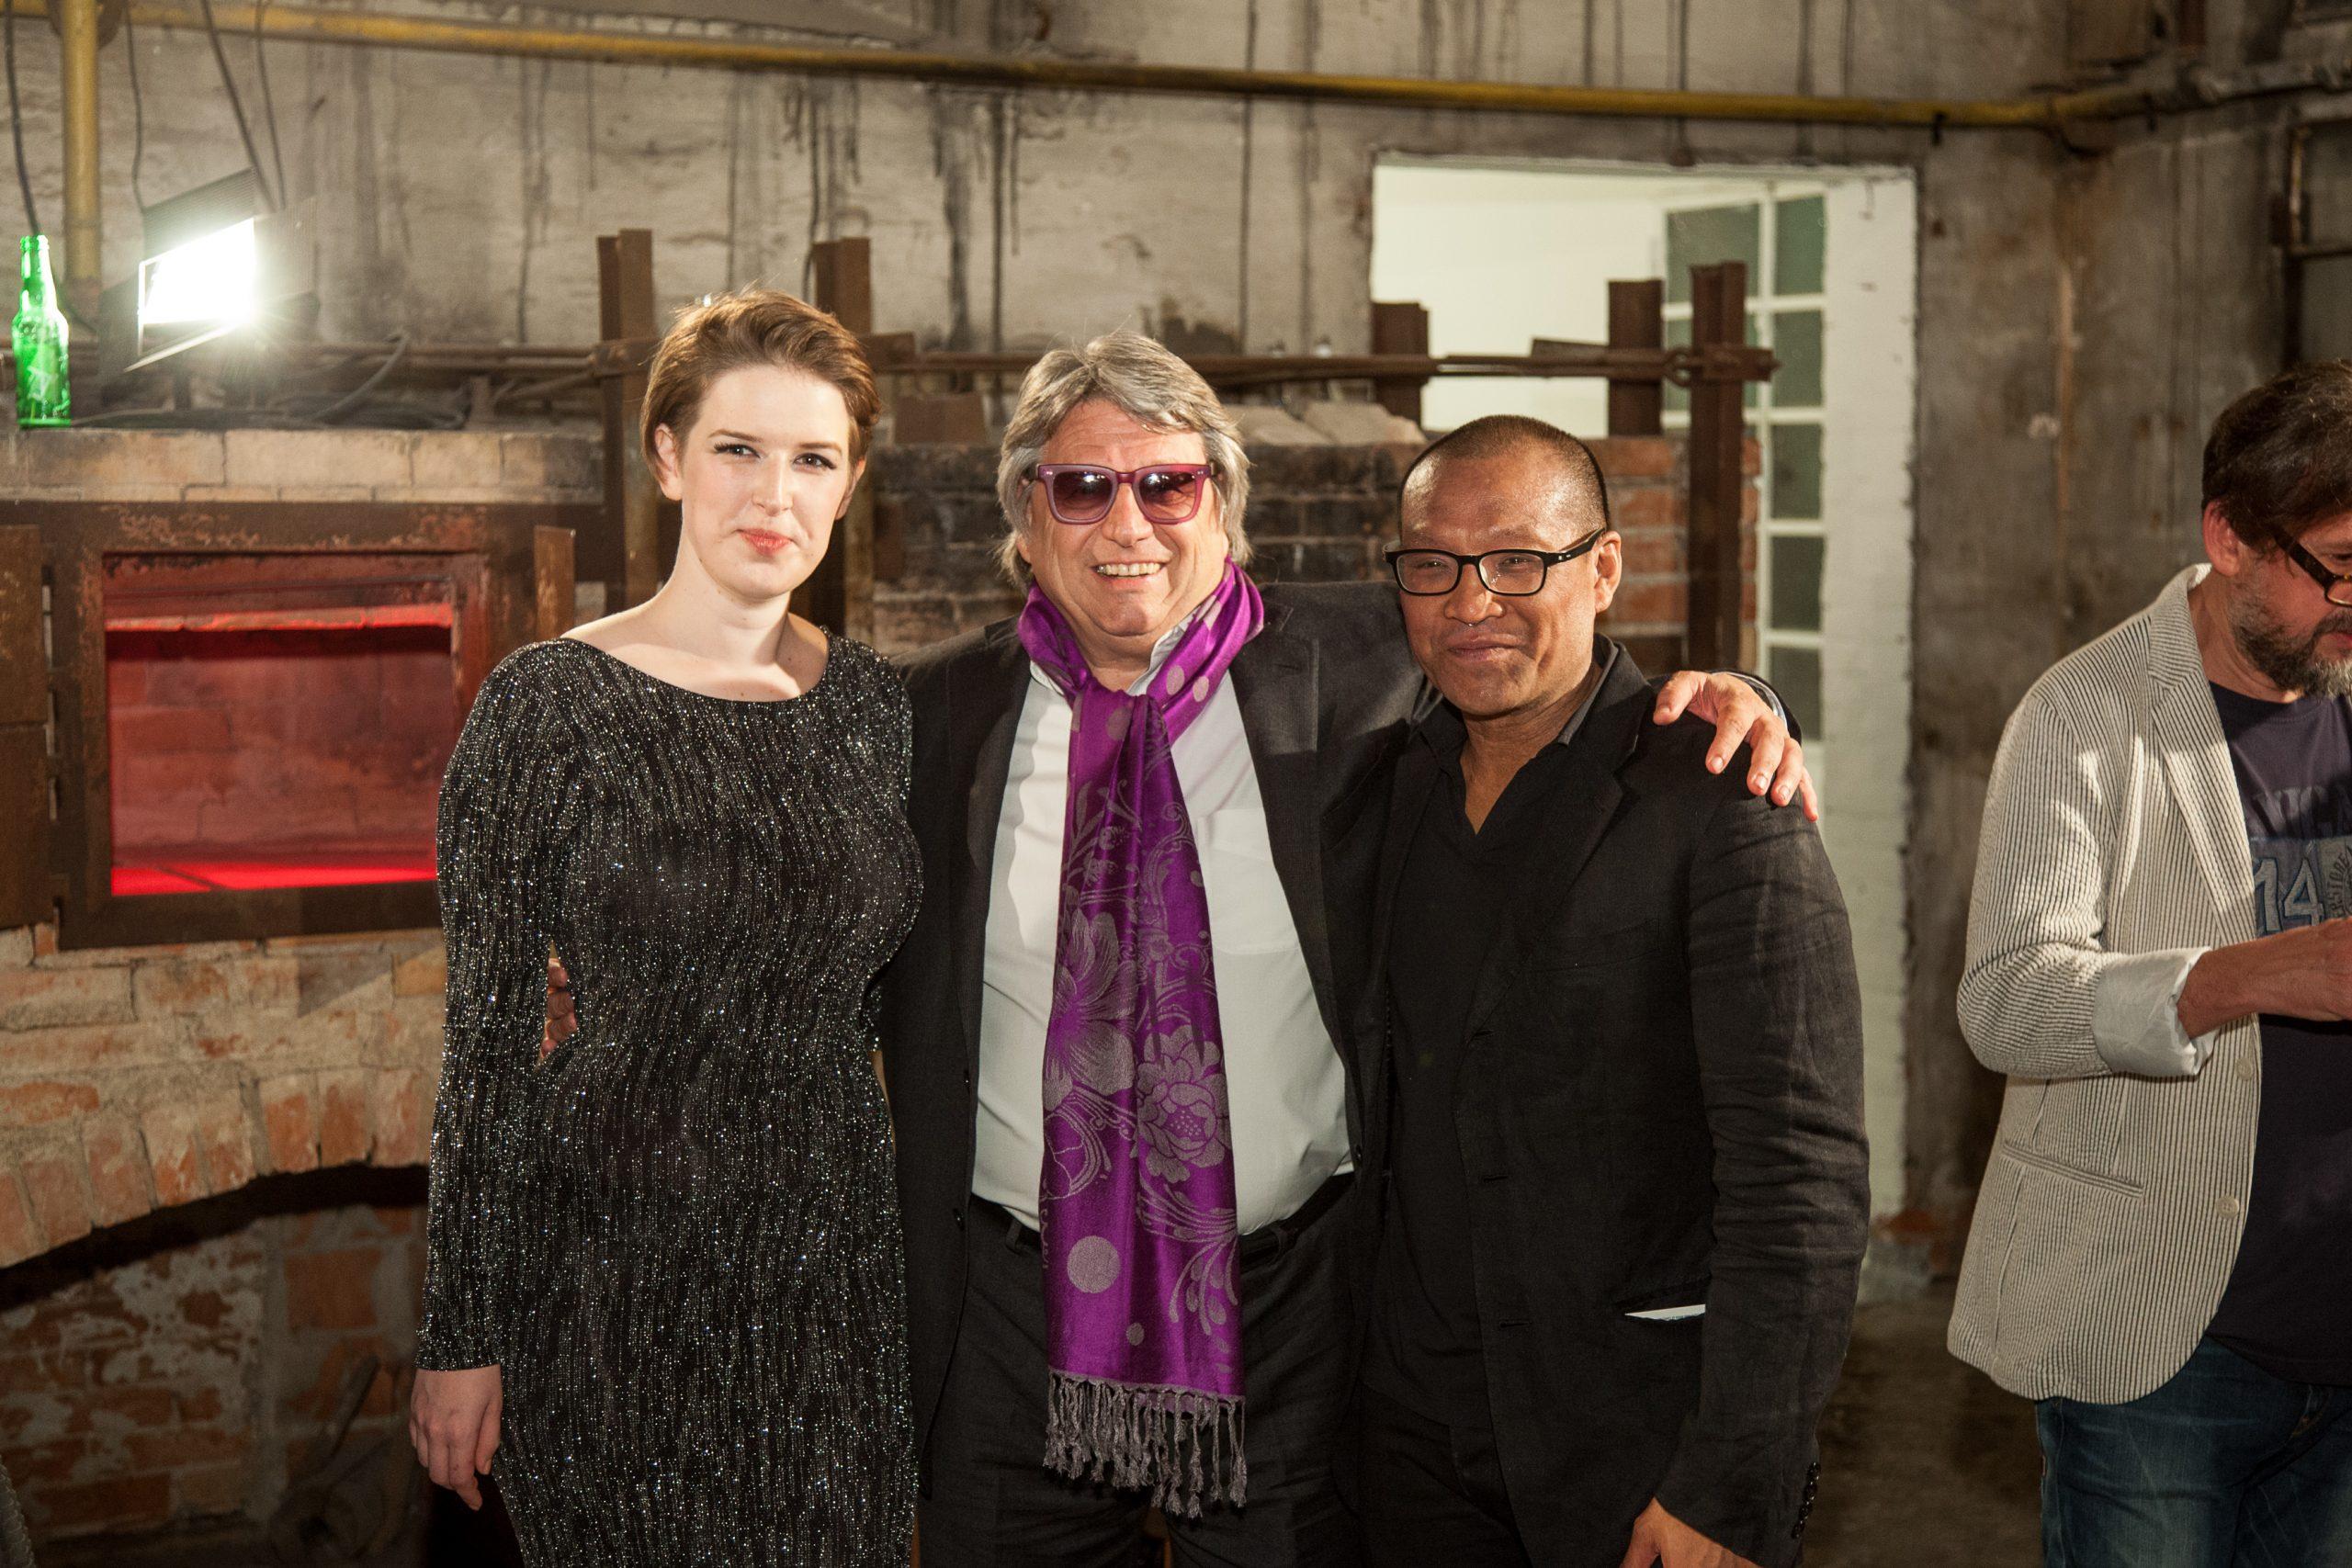 Erin Dickson, Adriano Berengo, and Jeffrey Sarmiento in Berengo Studio